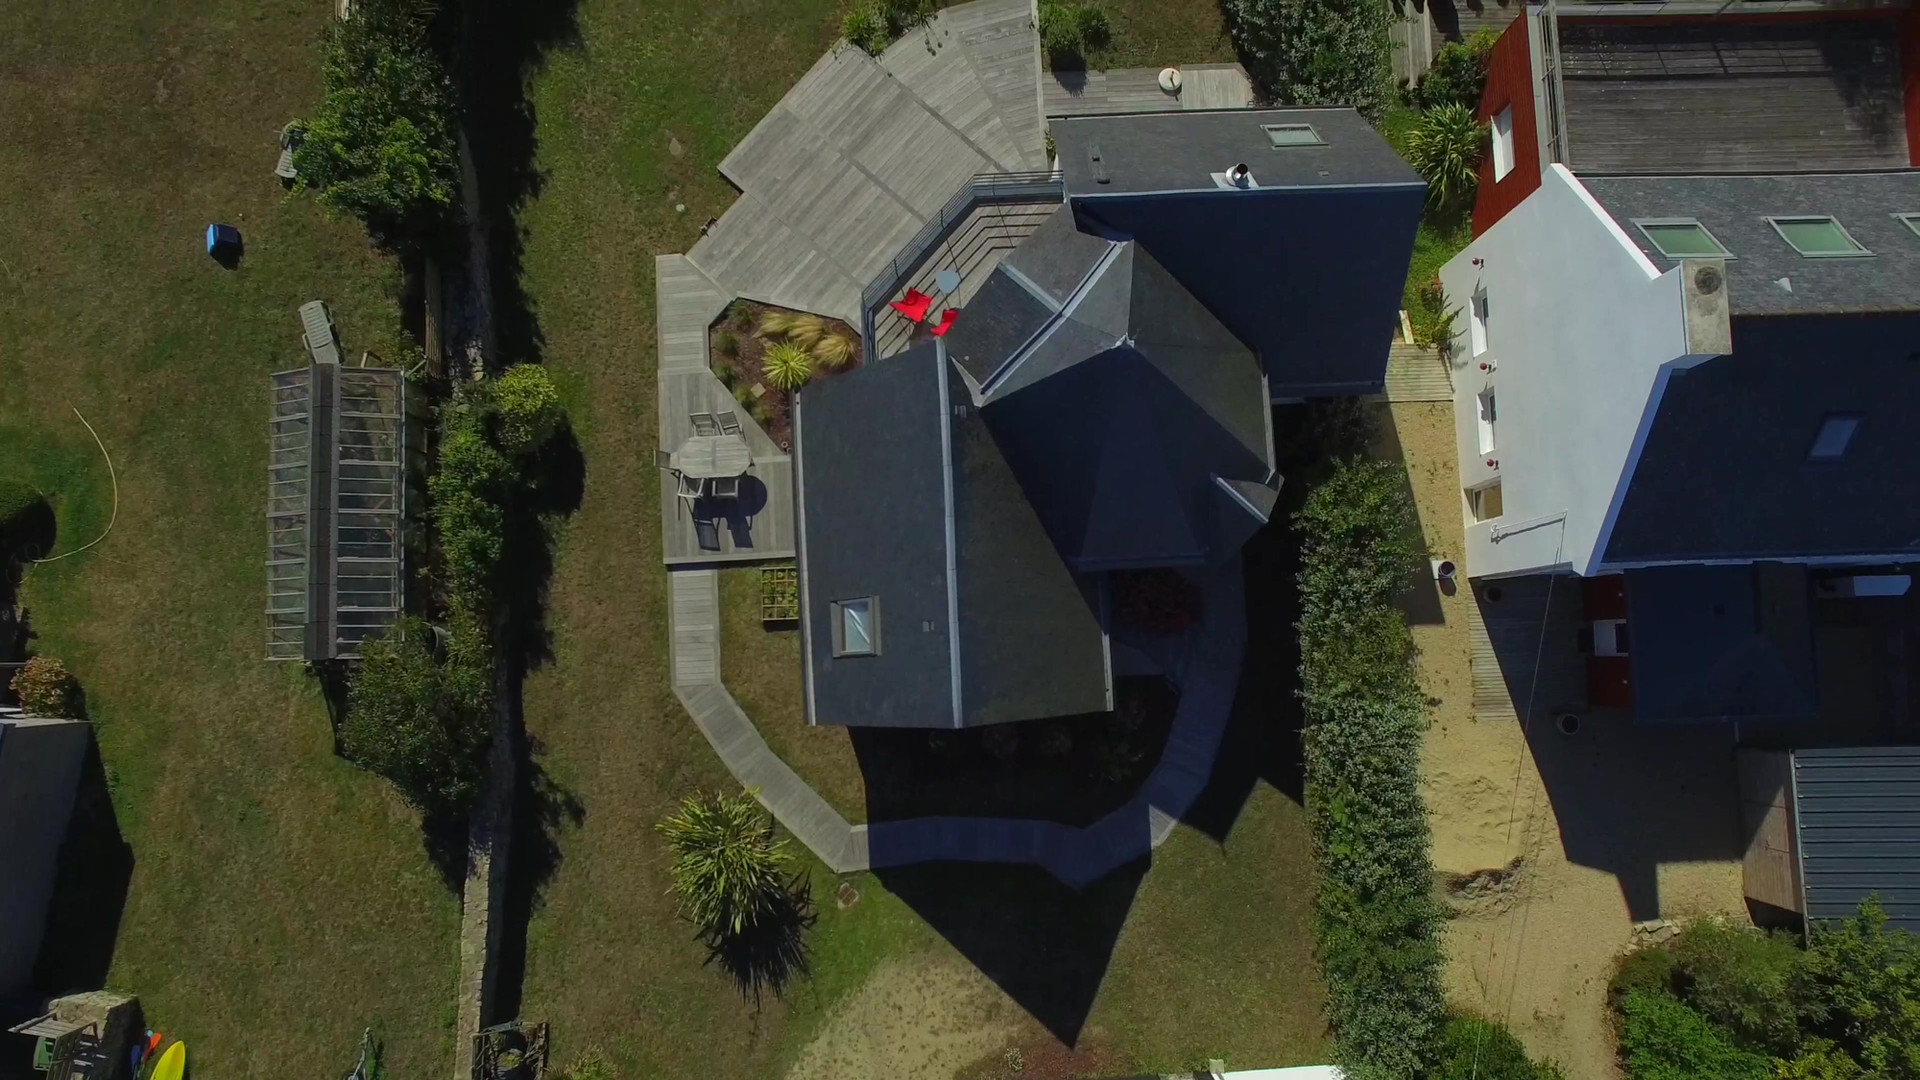 FlyUp Drone - maison à vendre - Plouharnel - Bretagne - France